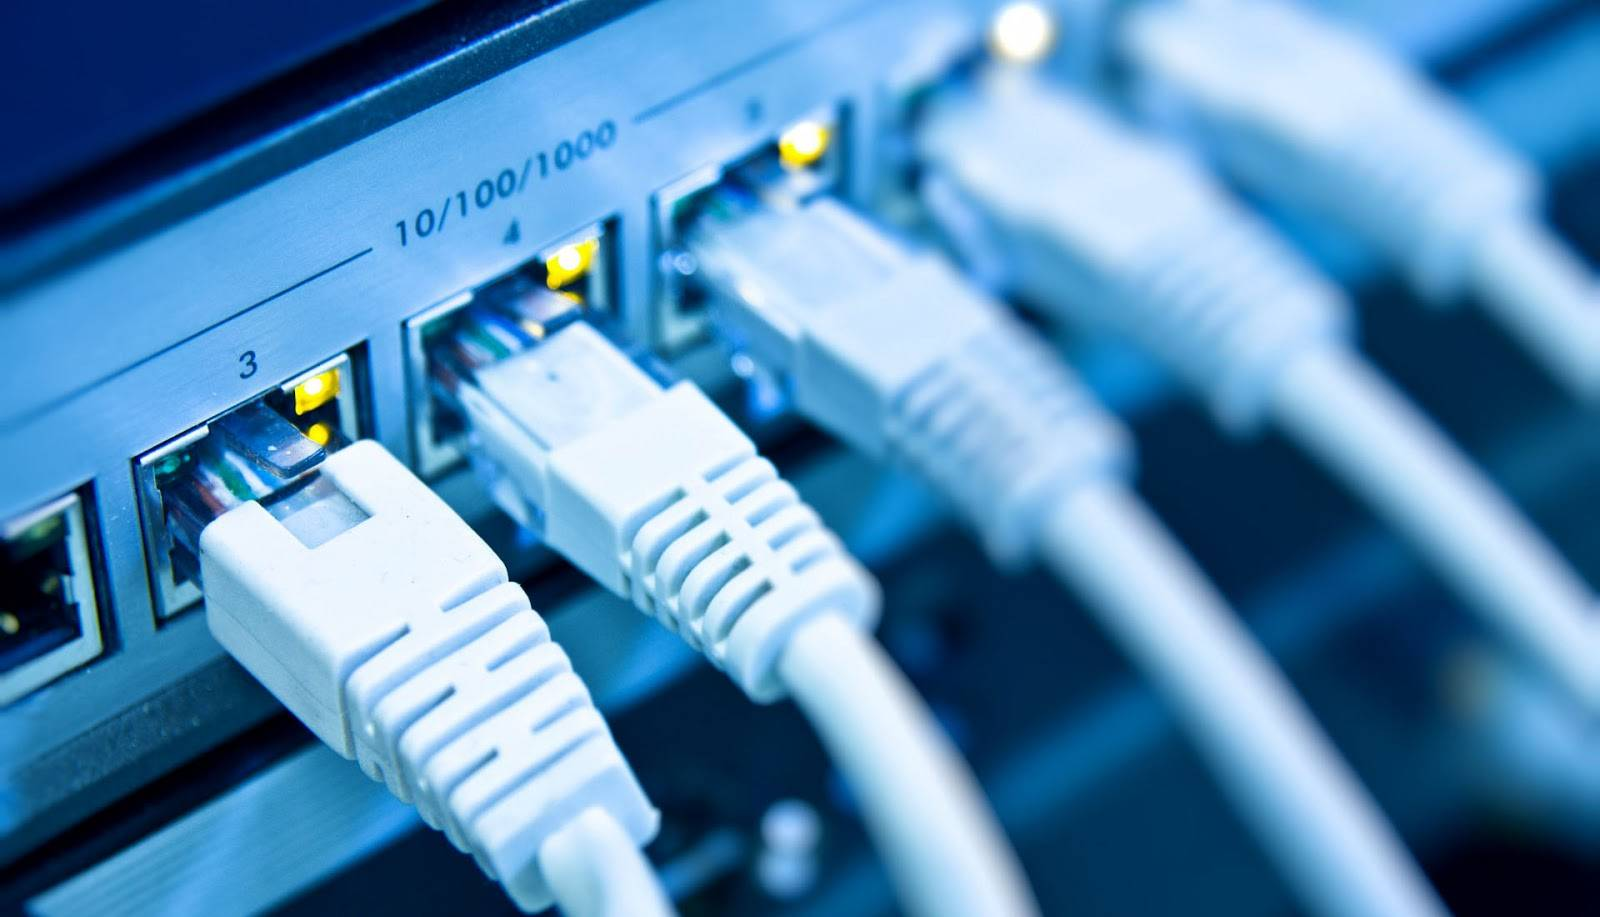 Internet: Algunos tips útiles para evitar que nuestra conexión se ponga lenta